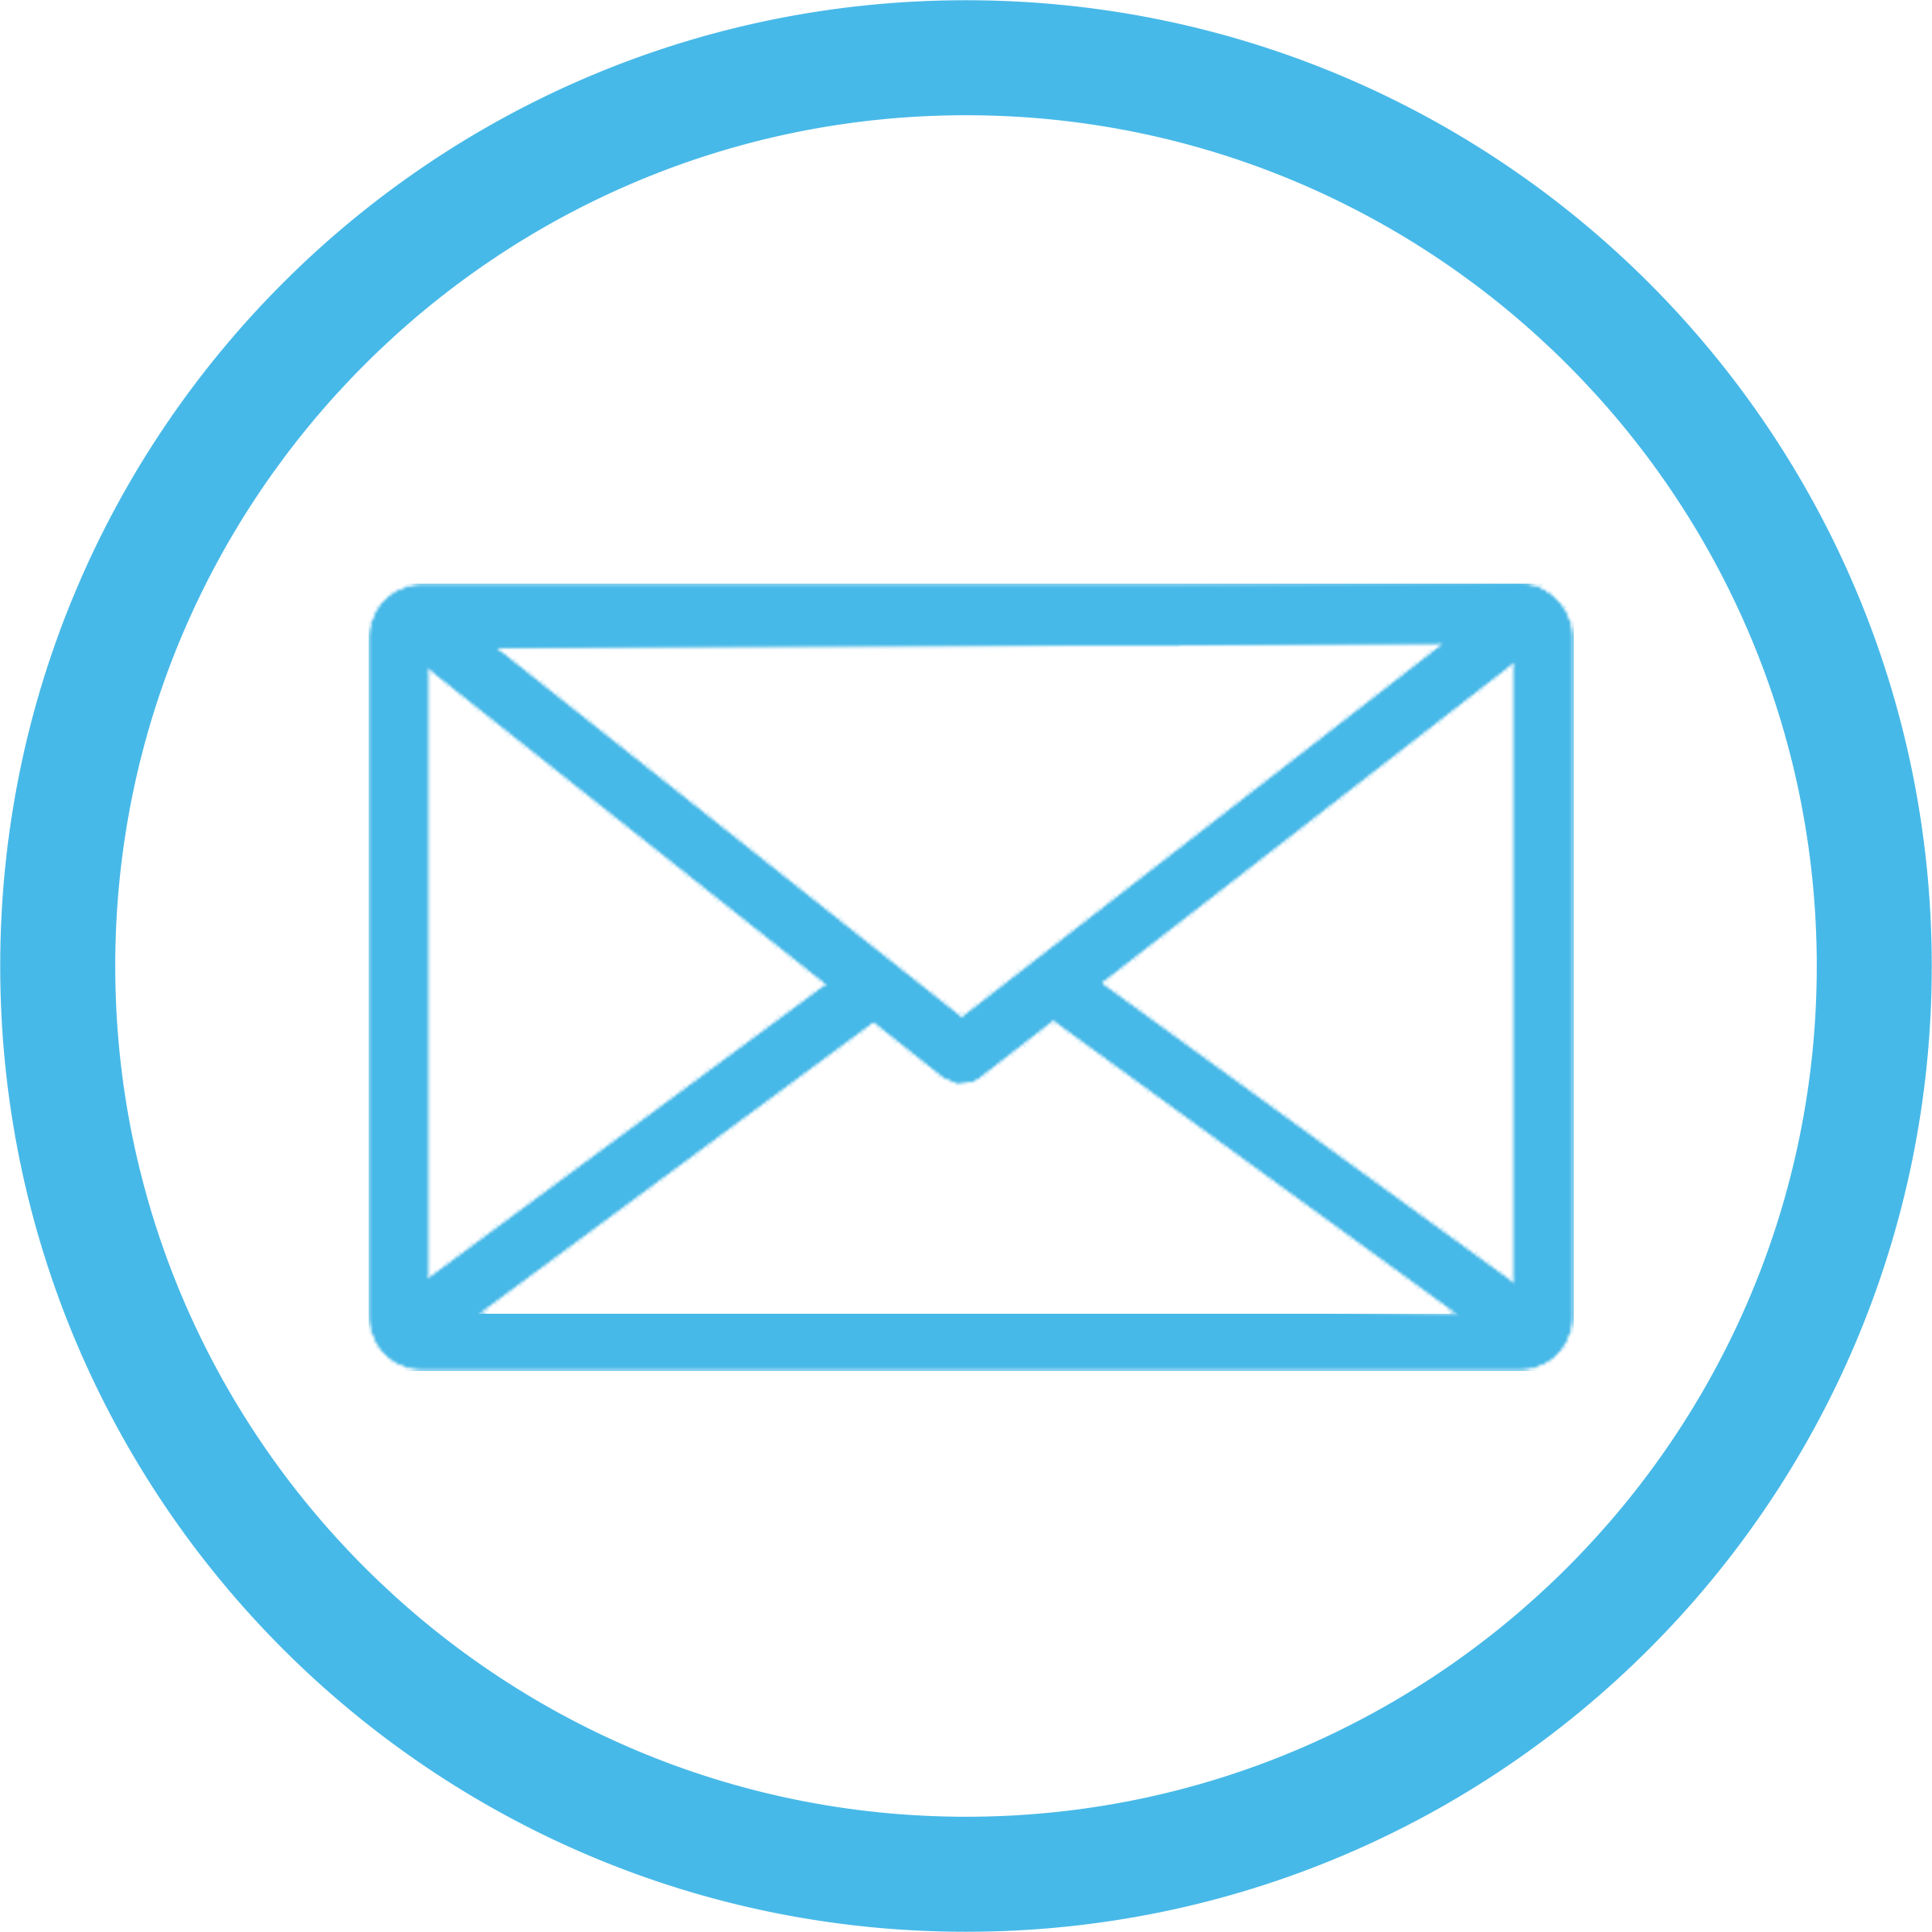 emaillogo - Hosting